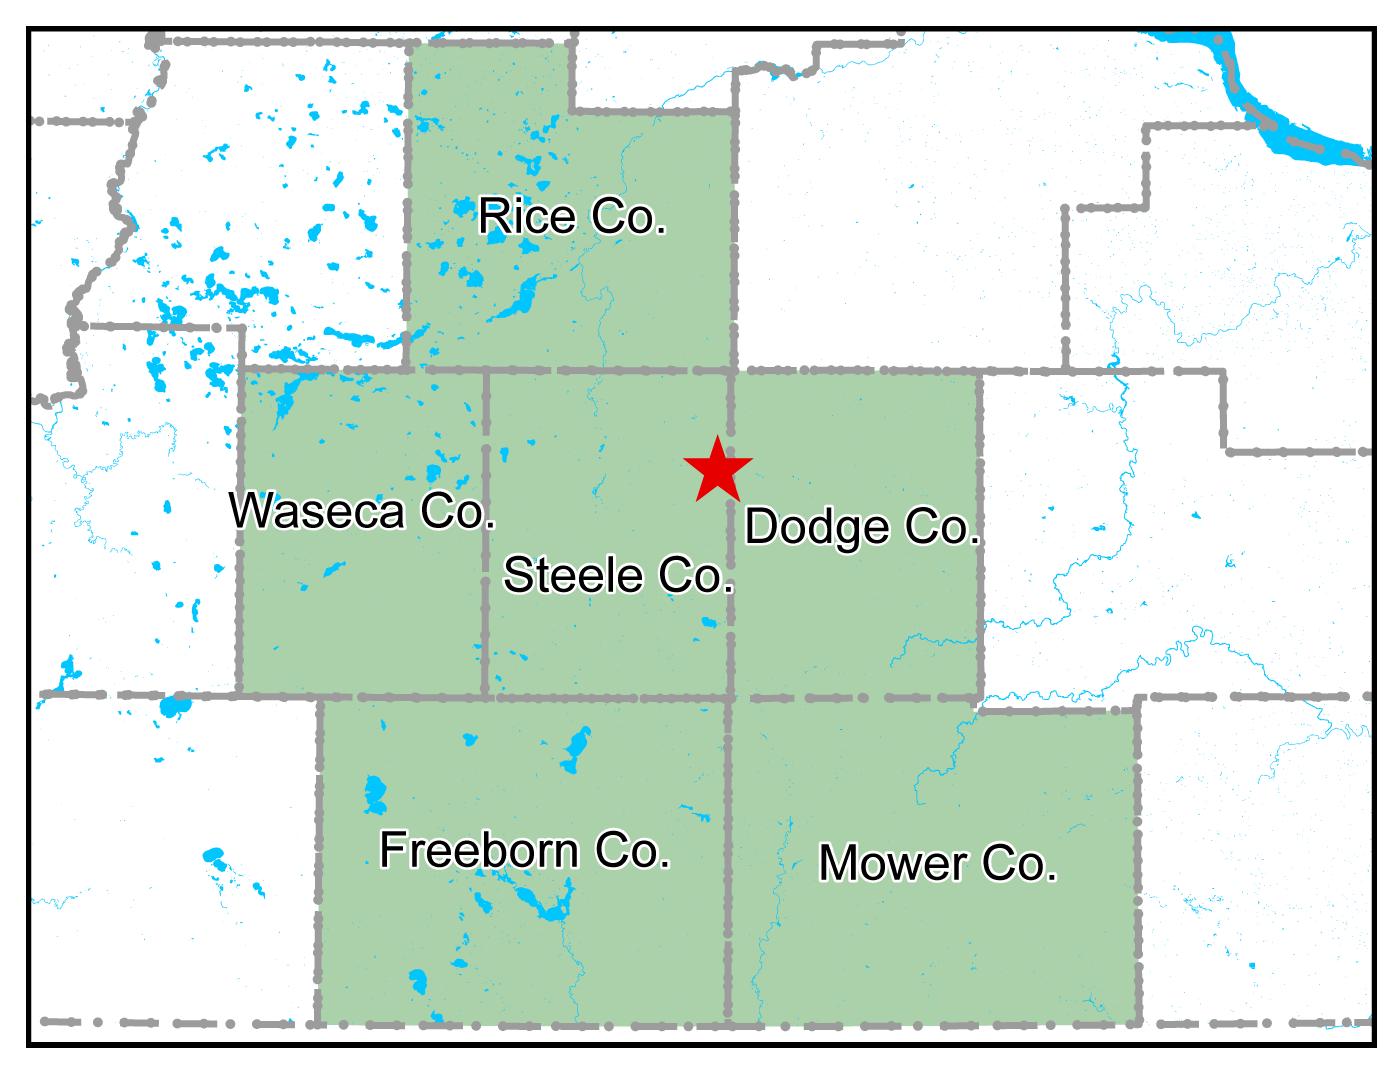 Map of Owatonna work area